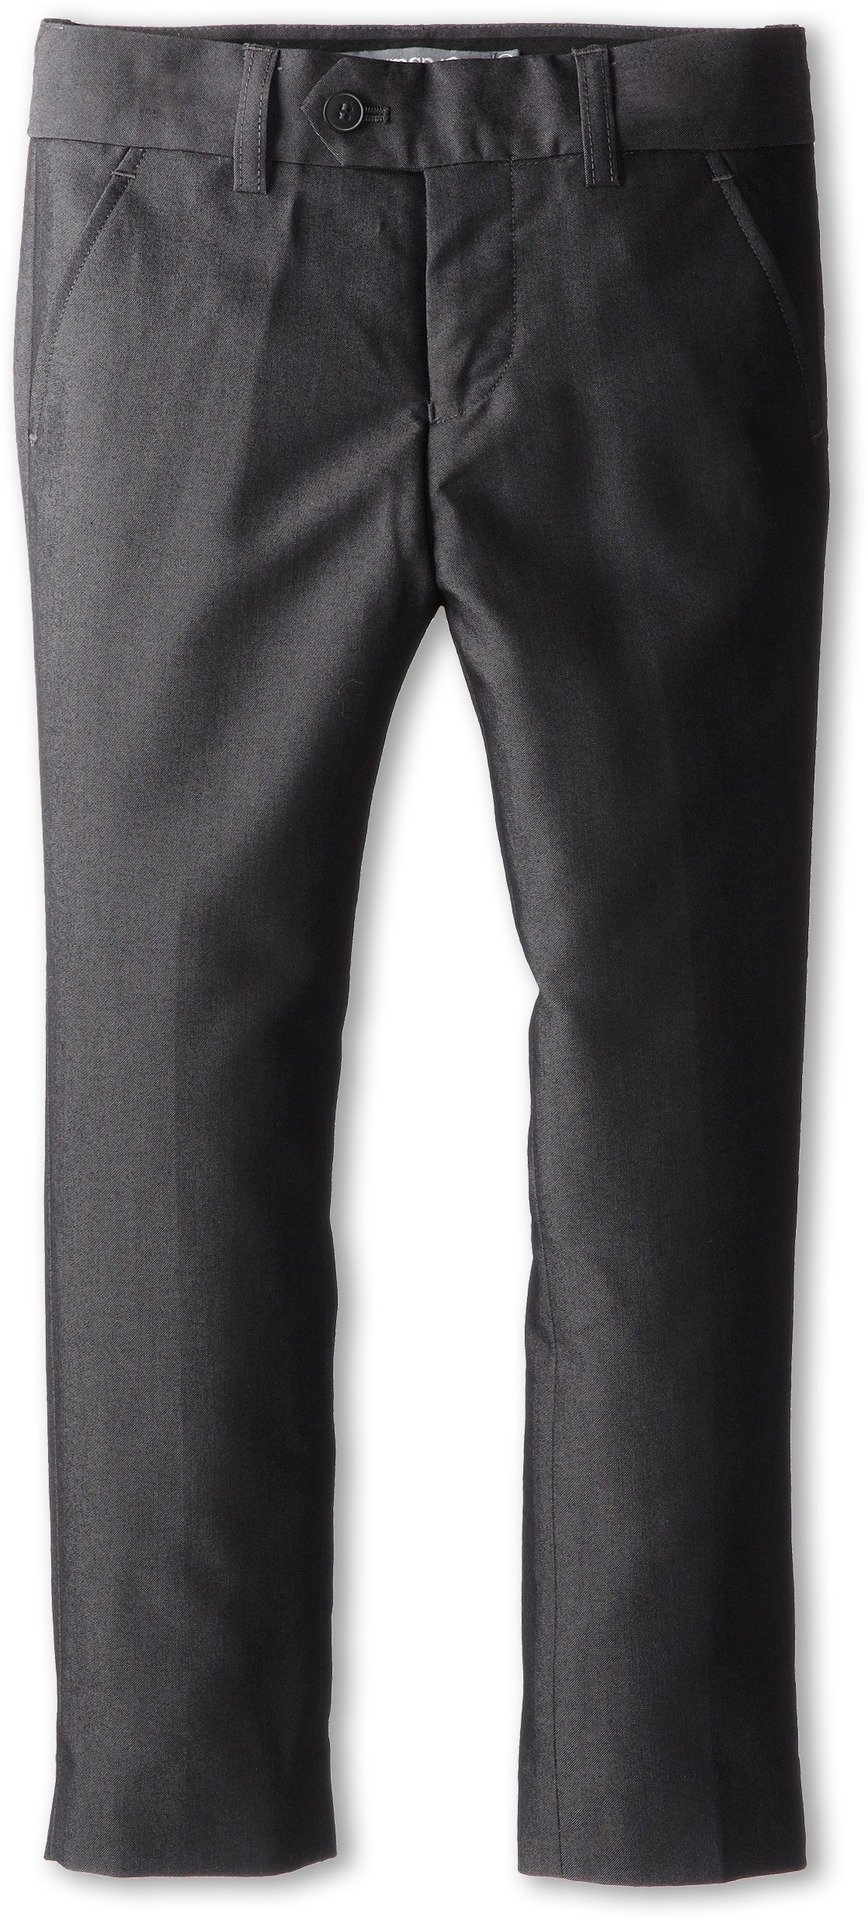 Appaman Little Boys' Mod Suit Pants, Vintage Black, 7 by Appaman (Image #1)